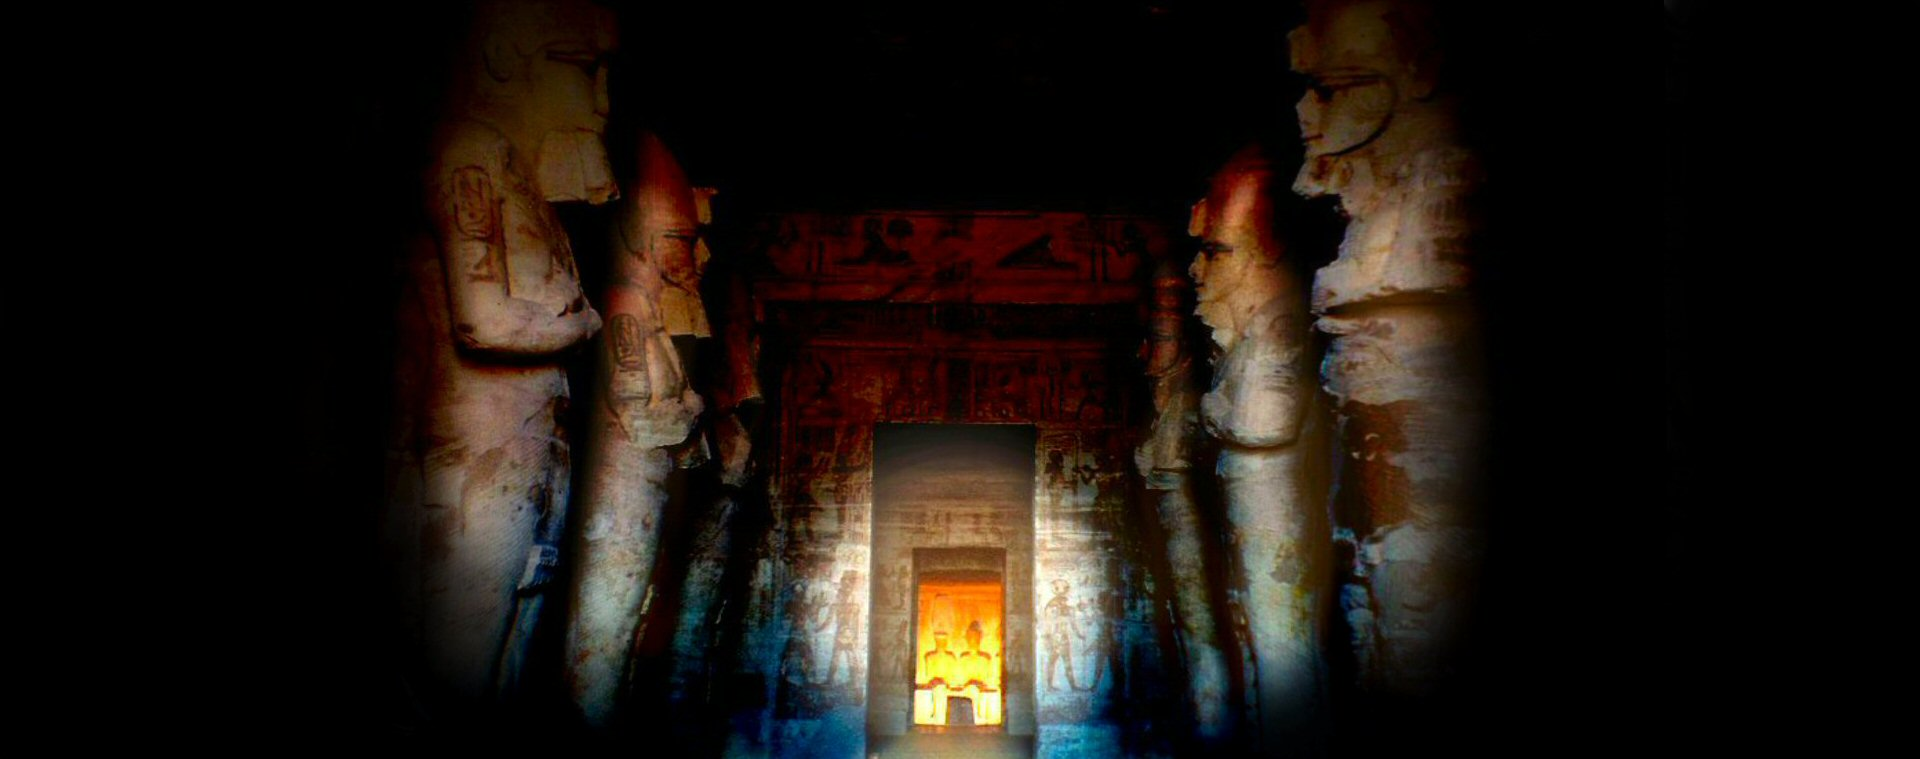 72-archeoastronomia_slid1